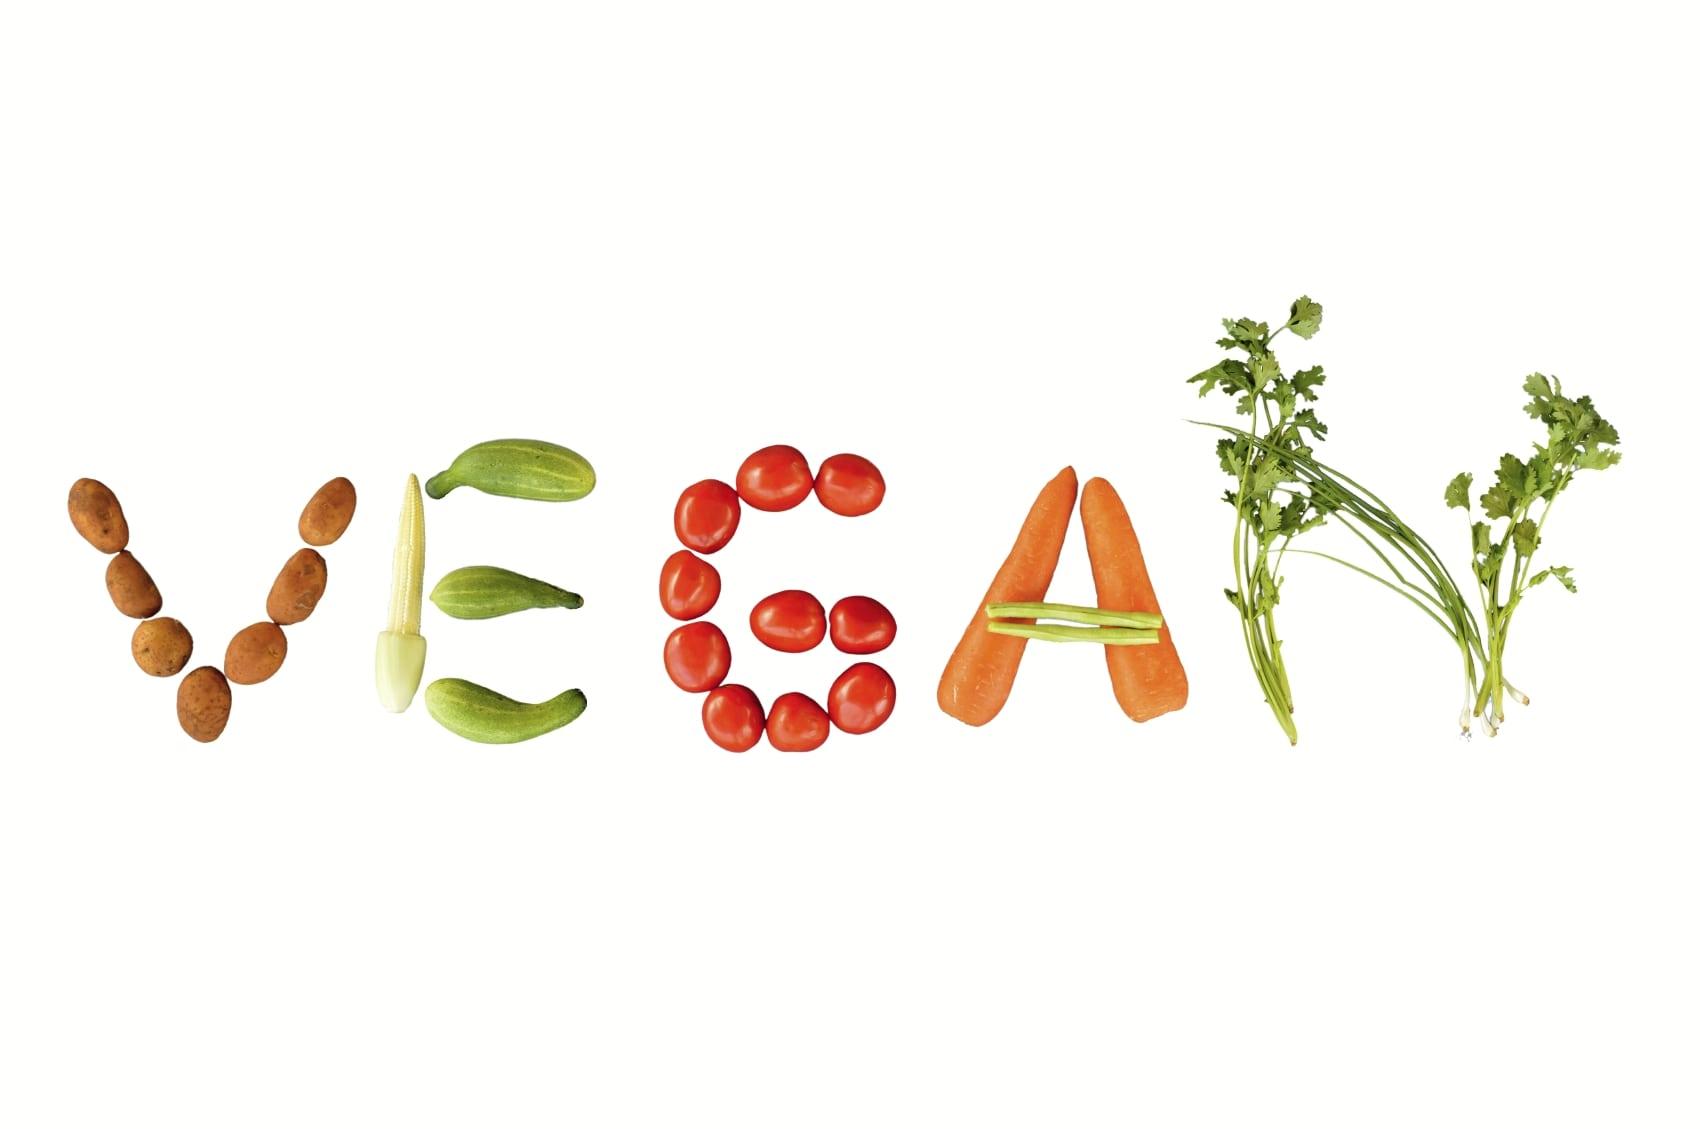 How Did Social Media Help Veganism Become Mainstream?